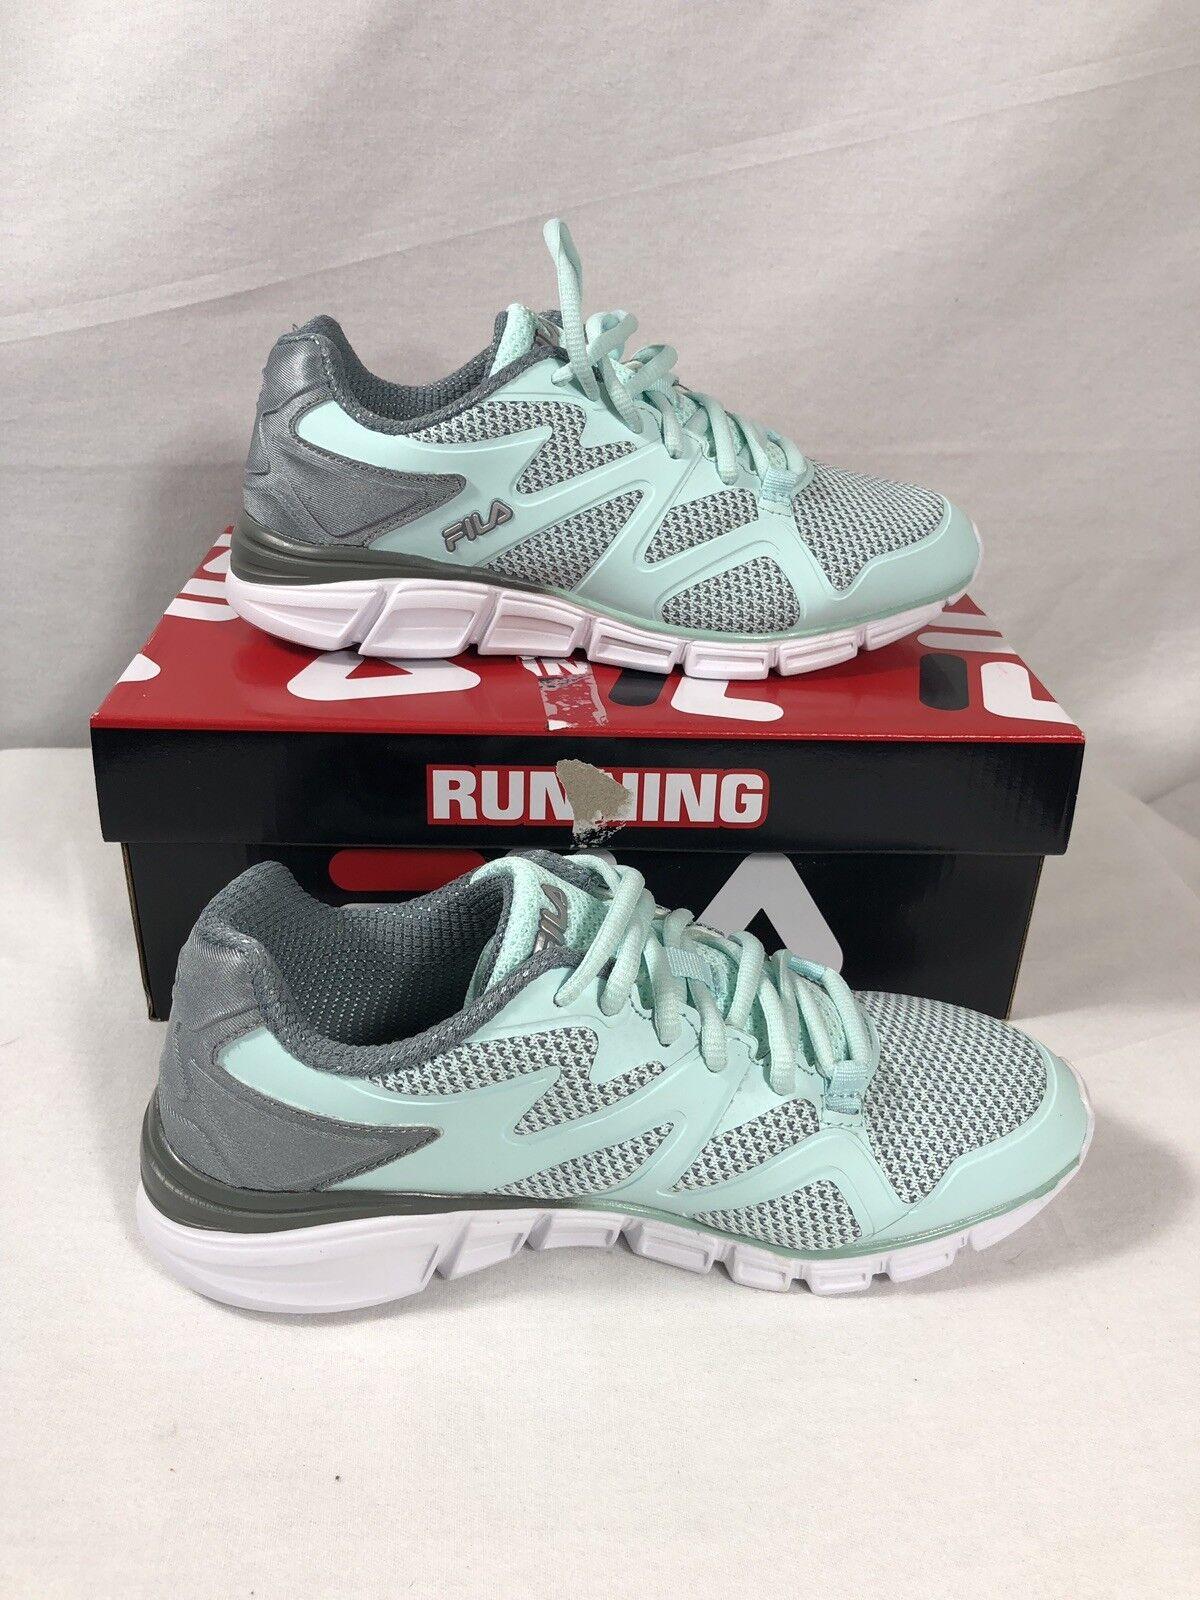 Fila Nib Turquoise Womens Tennis shoes Cryptonic II Size 6